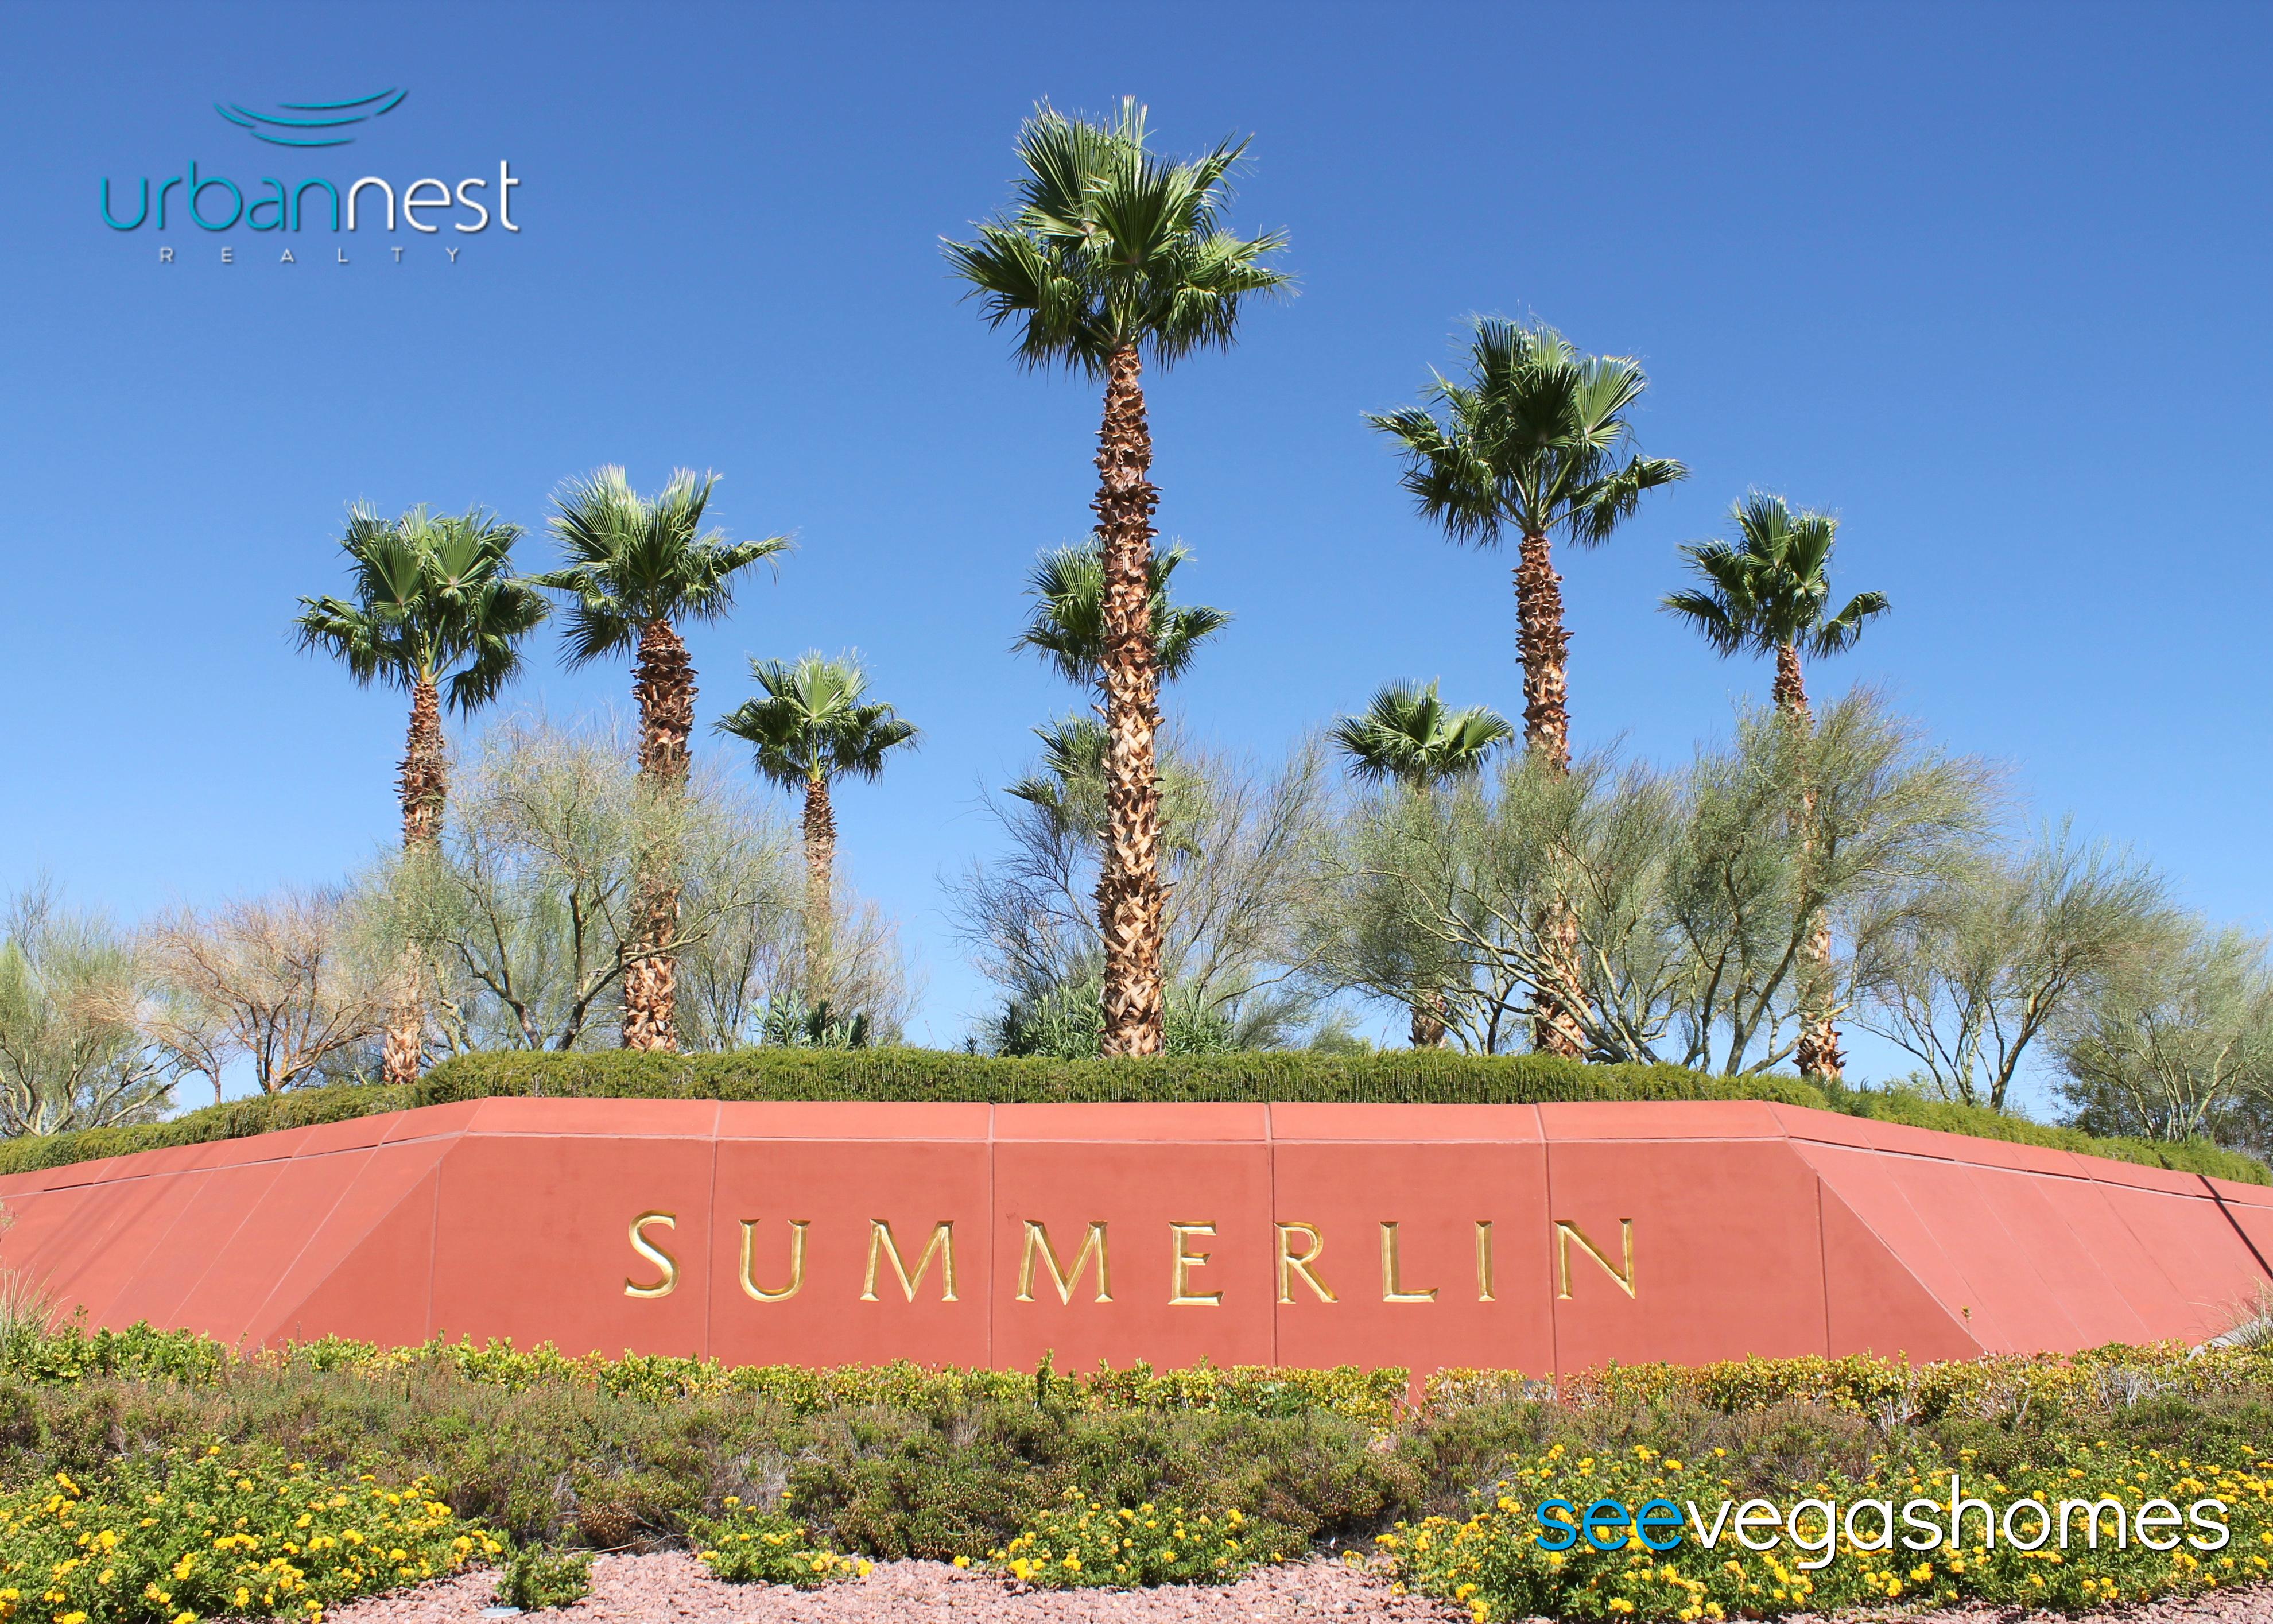 Summerlin Las Vegas NV SeeVegasHomes